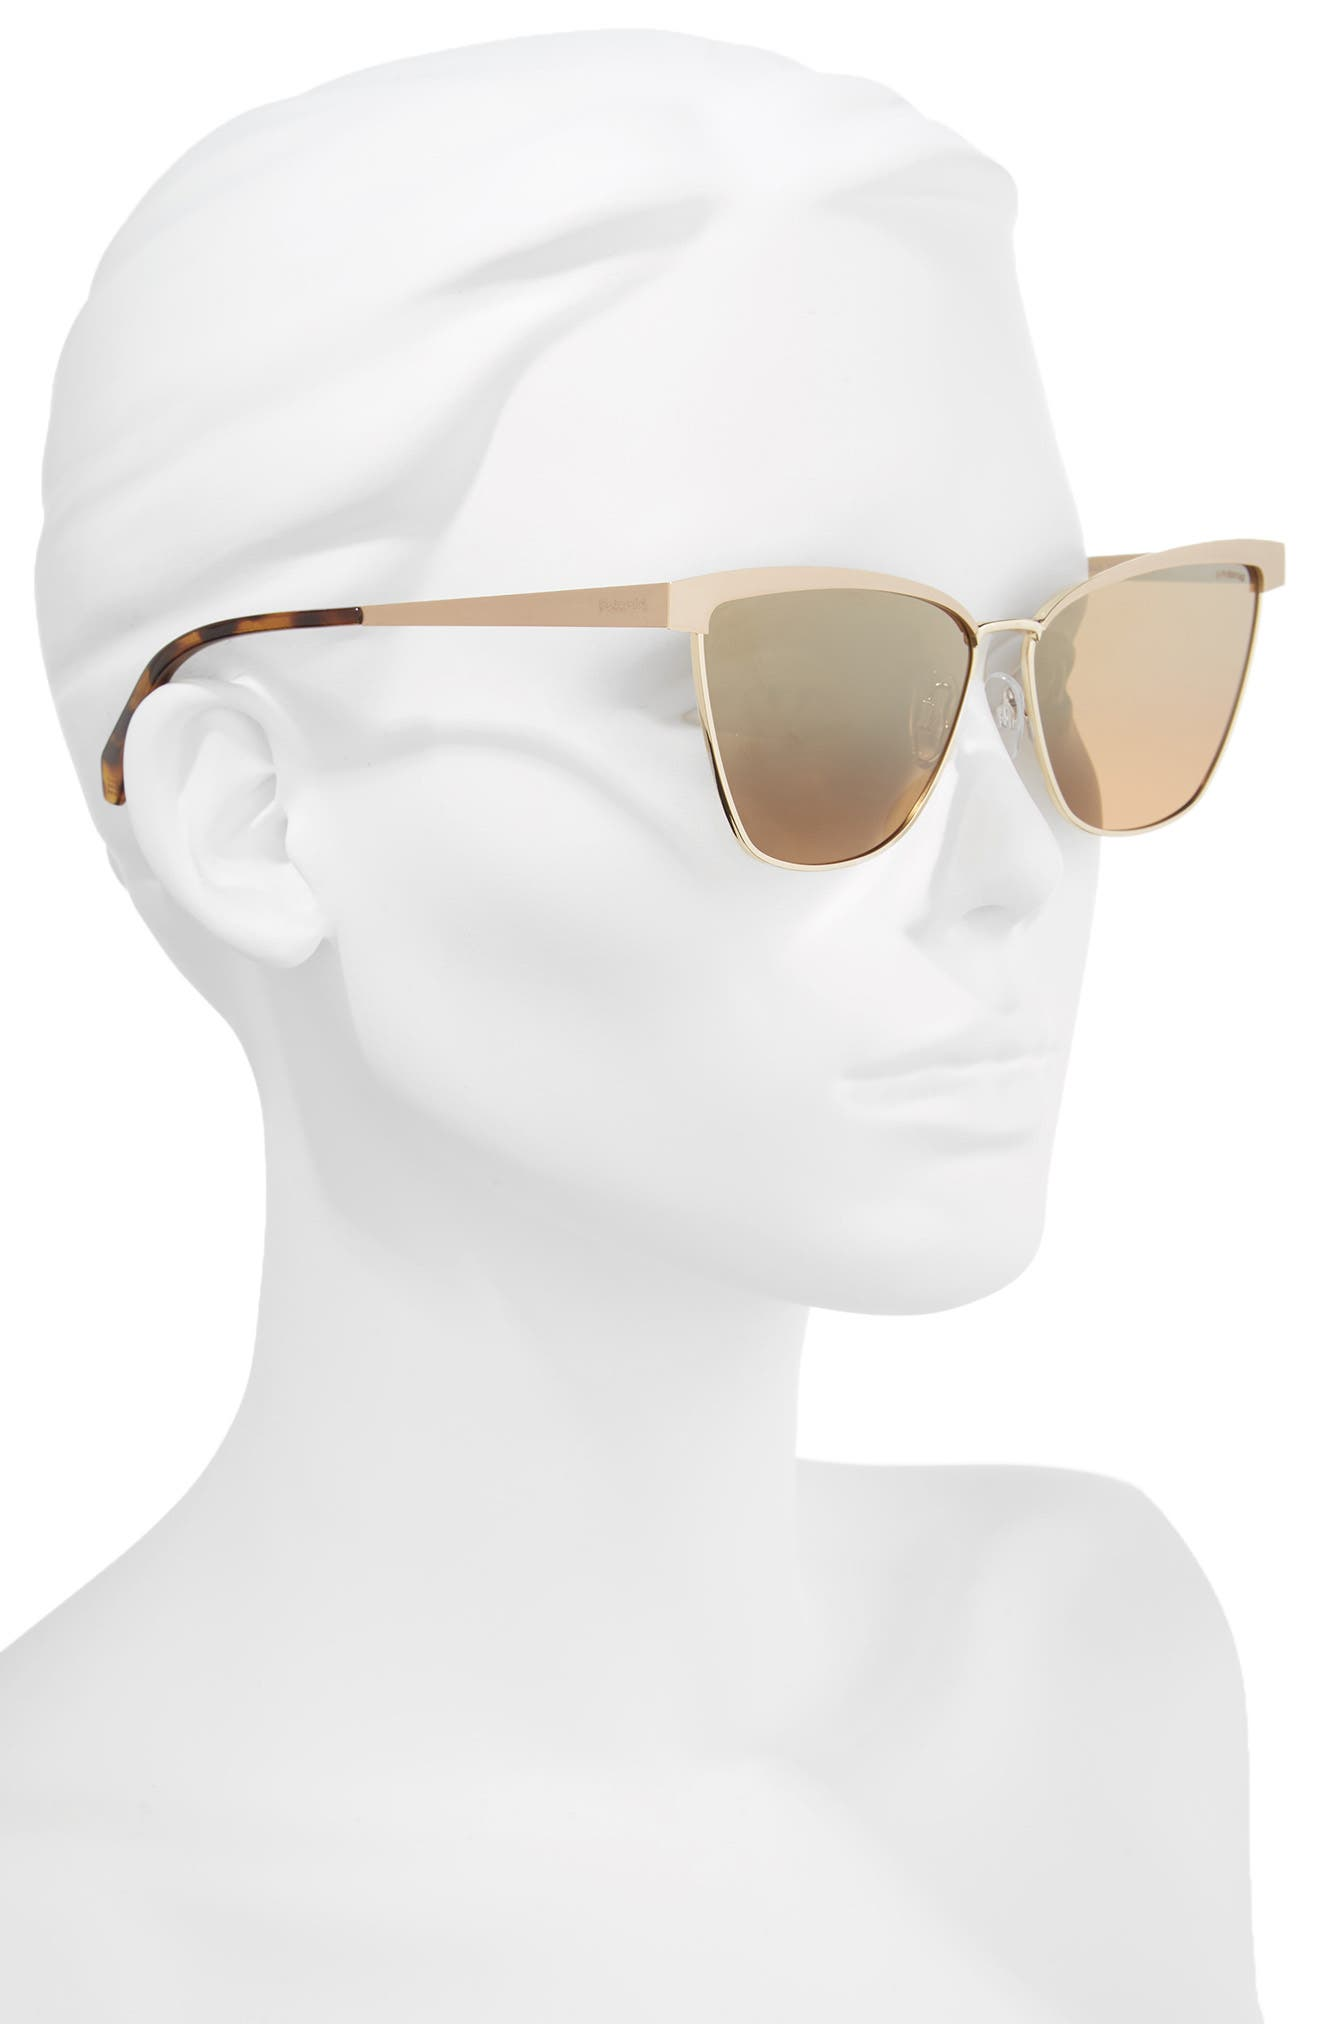 60mm Polarized Cat Eye Sunglasses,                             Alternate thumbnail 4, color,